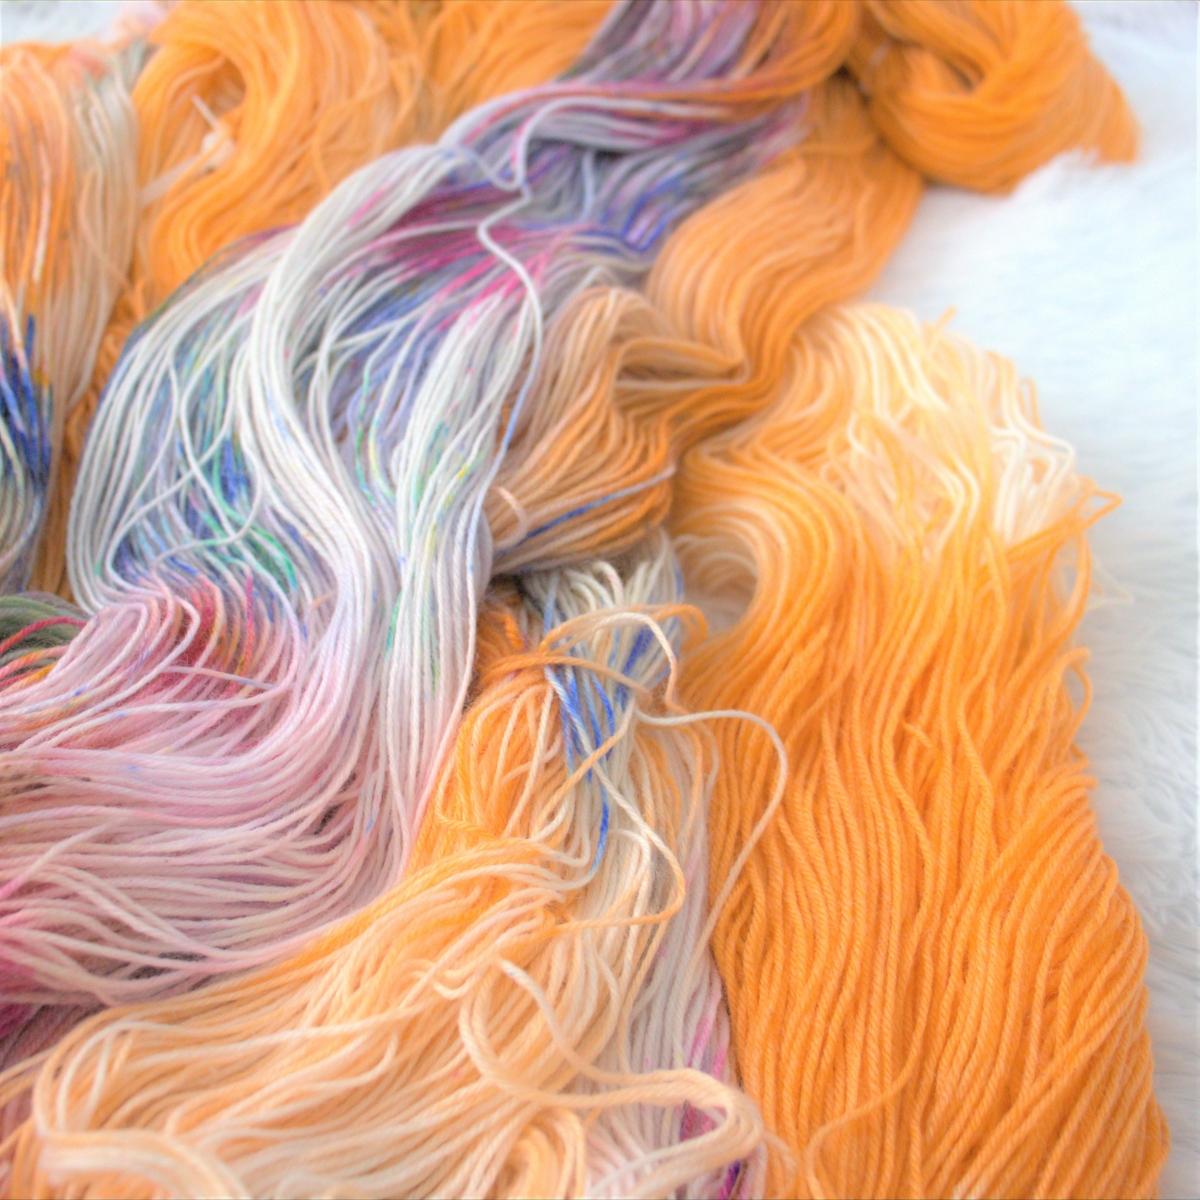 woodico.pro hand dyed yarn 044 copy 1200x1200 - Hand dyed yarn / 045